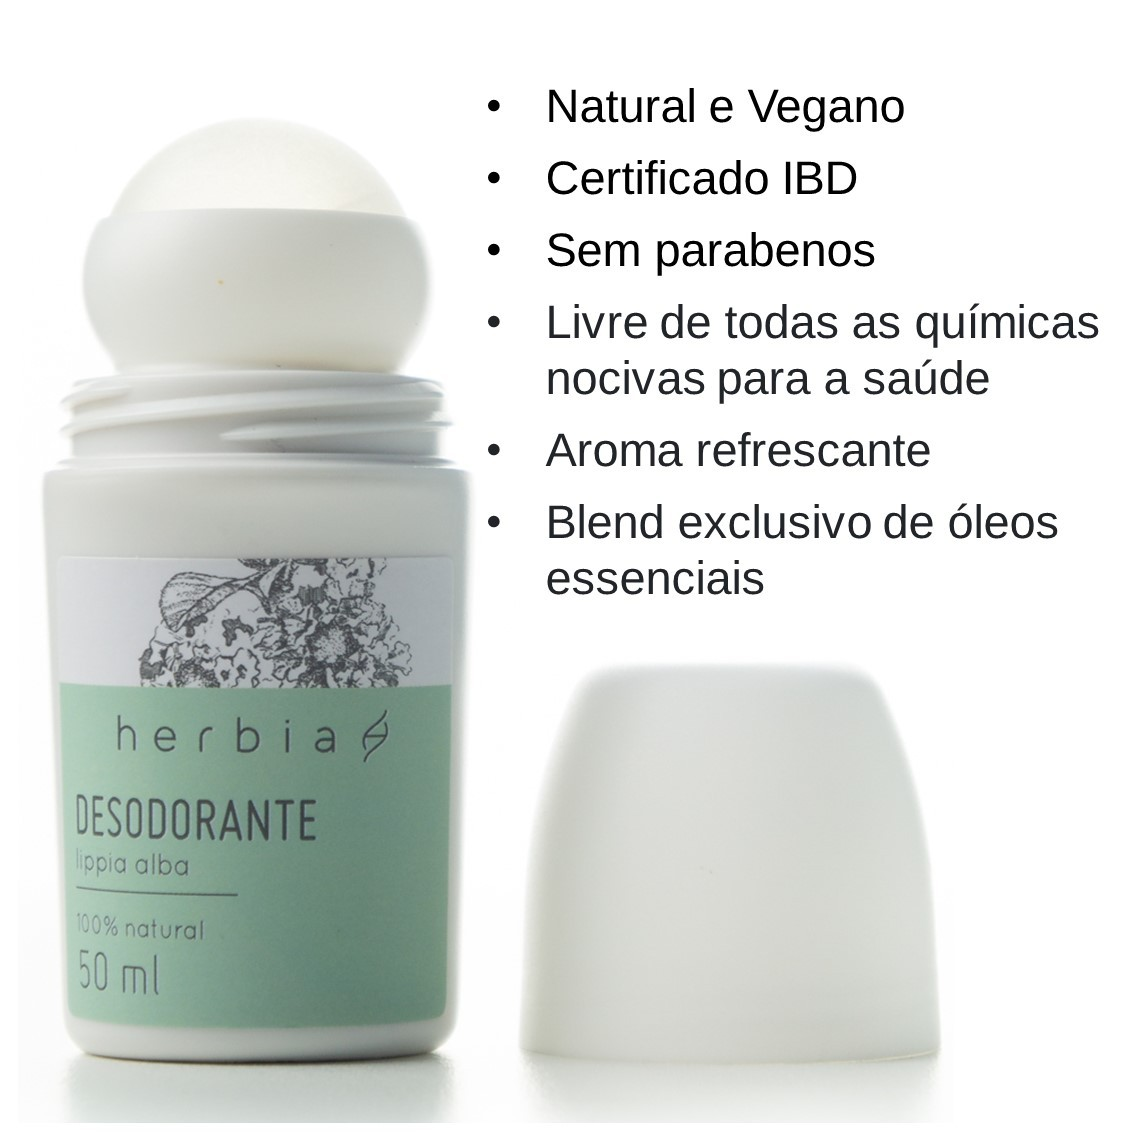 Desodorante Roll-on Lippia Alba Certificado IBD